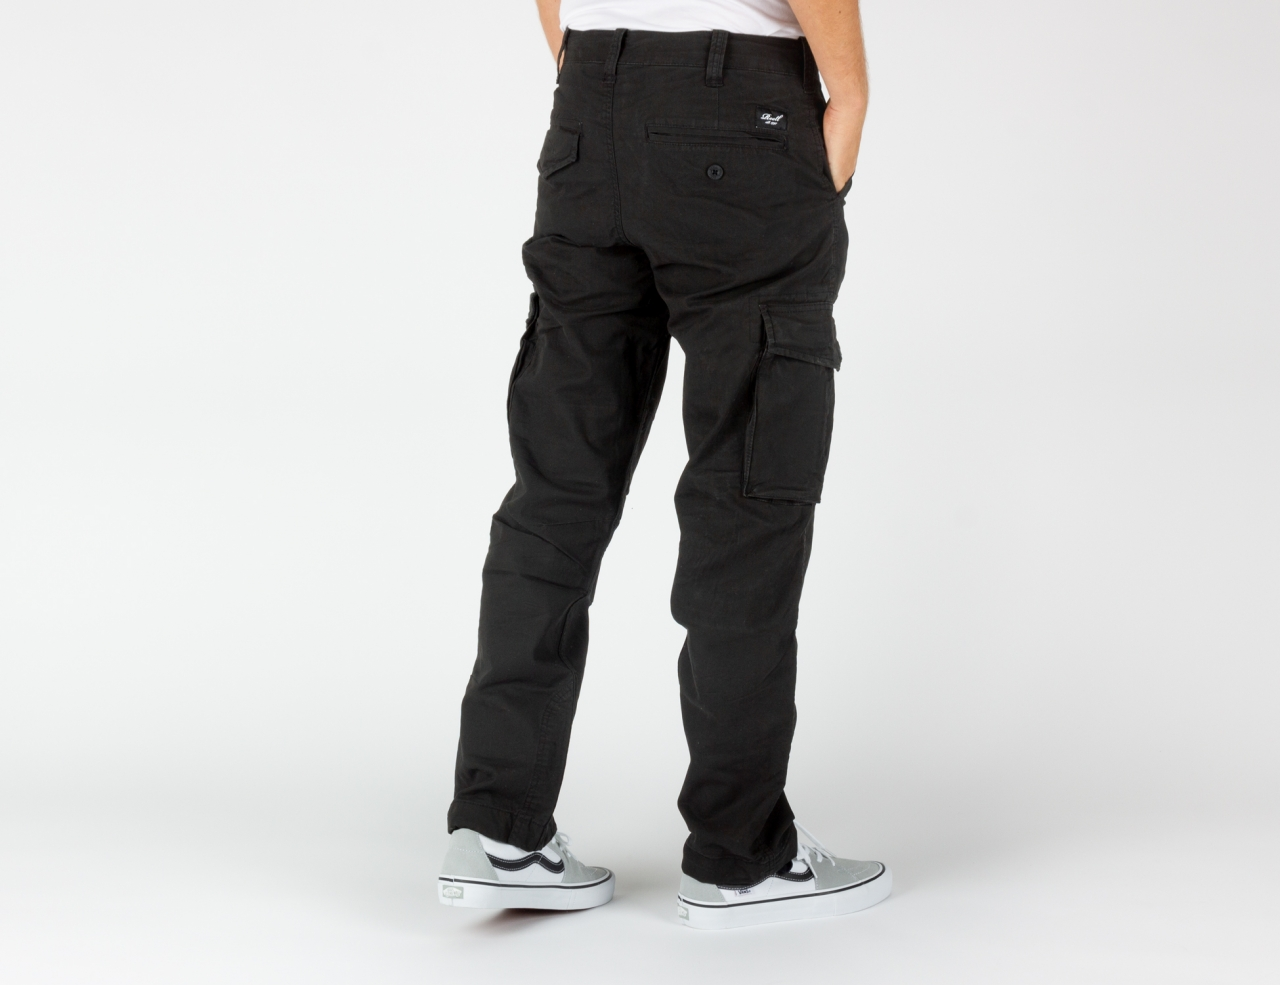 Reell Jeans Flex Cargo LC Pant - Black Canvas